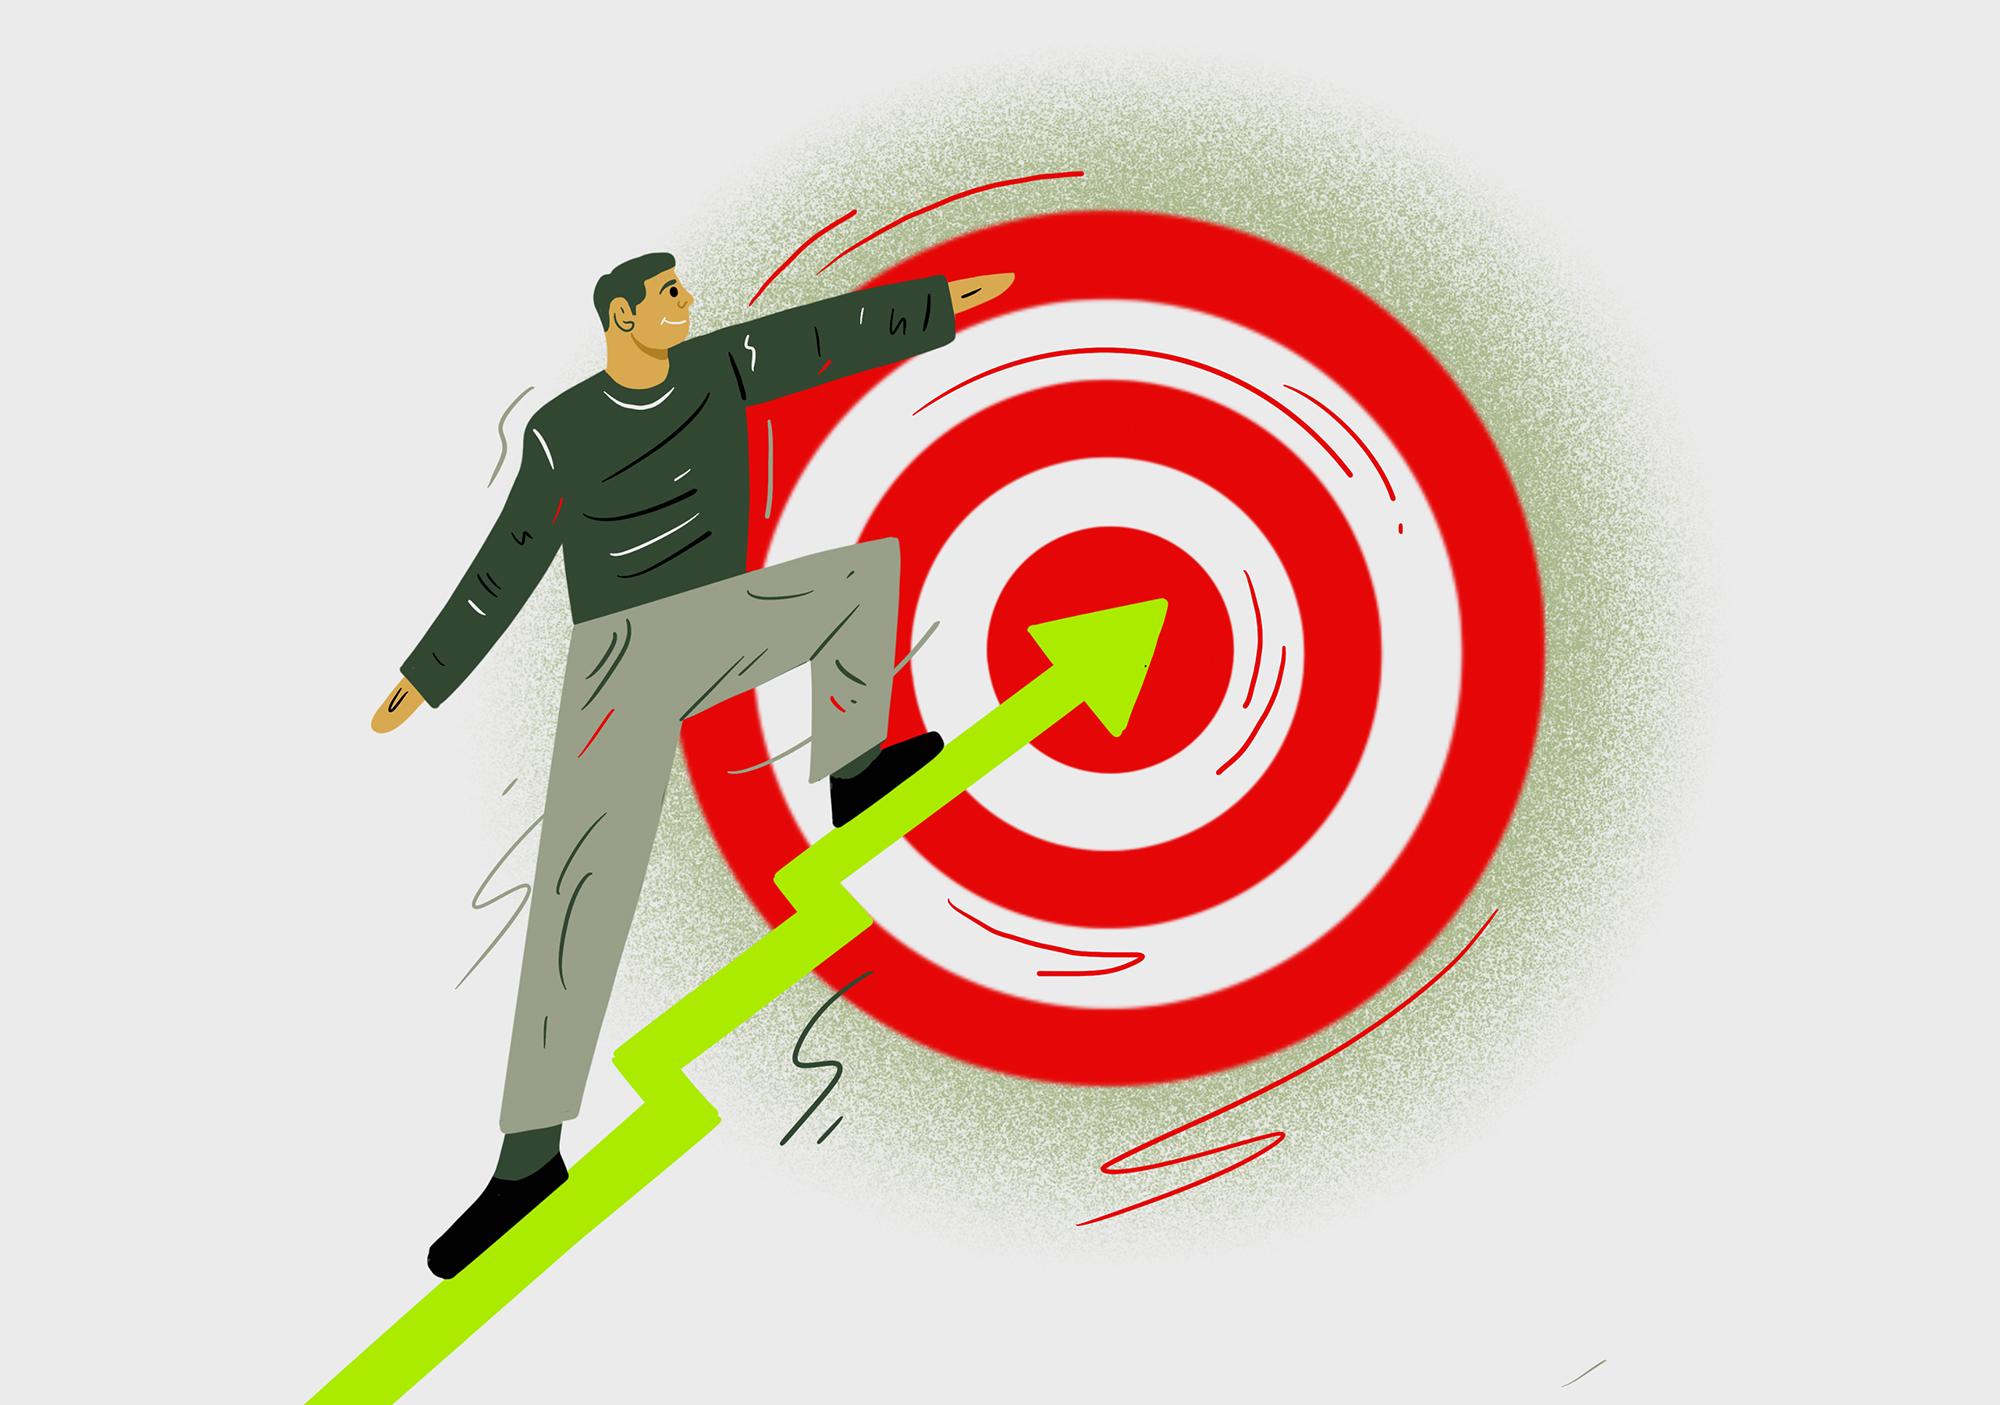 Illustration of a man setting a goal